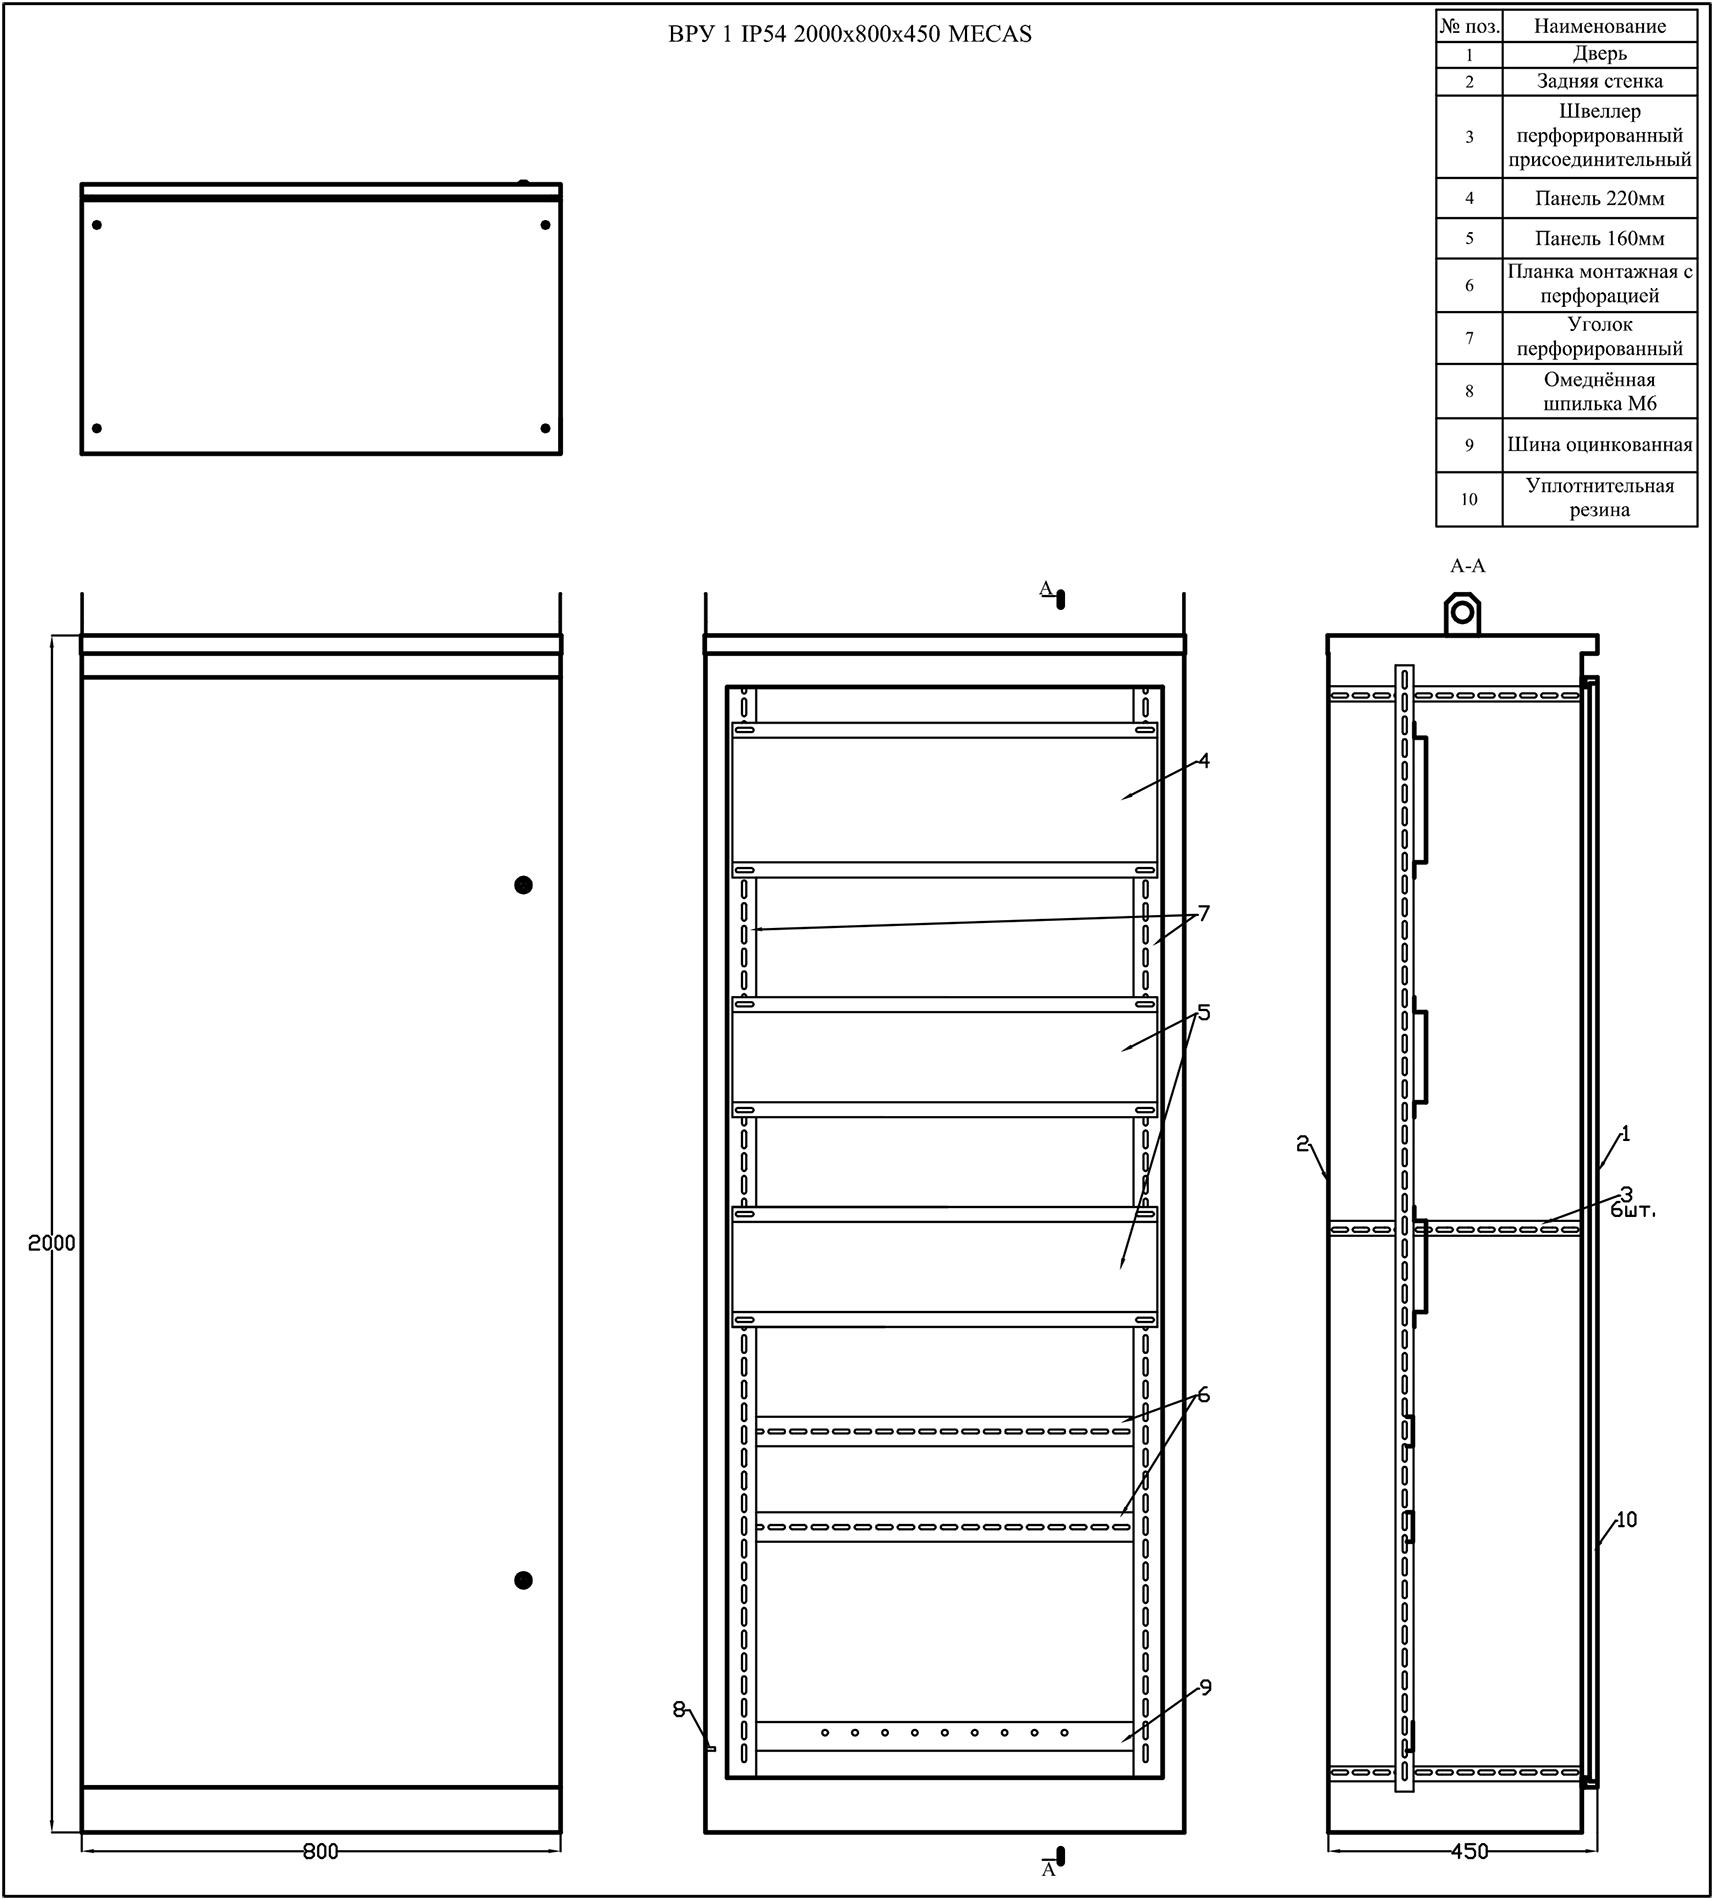 Корпус ВРУ-1 IP54 2000х800х450 MECAS